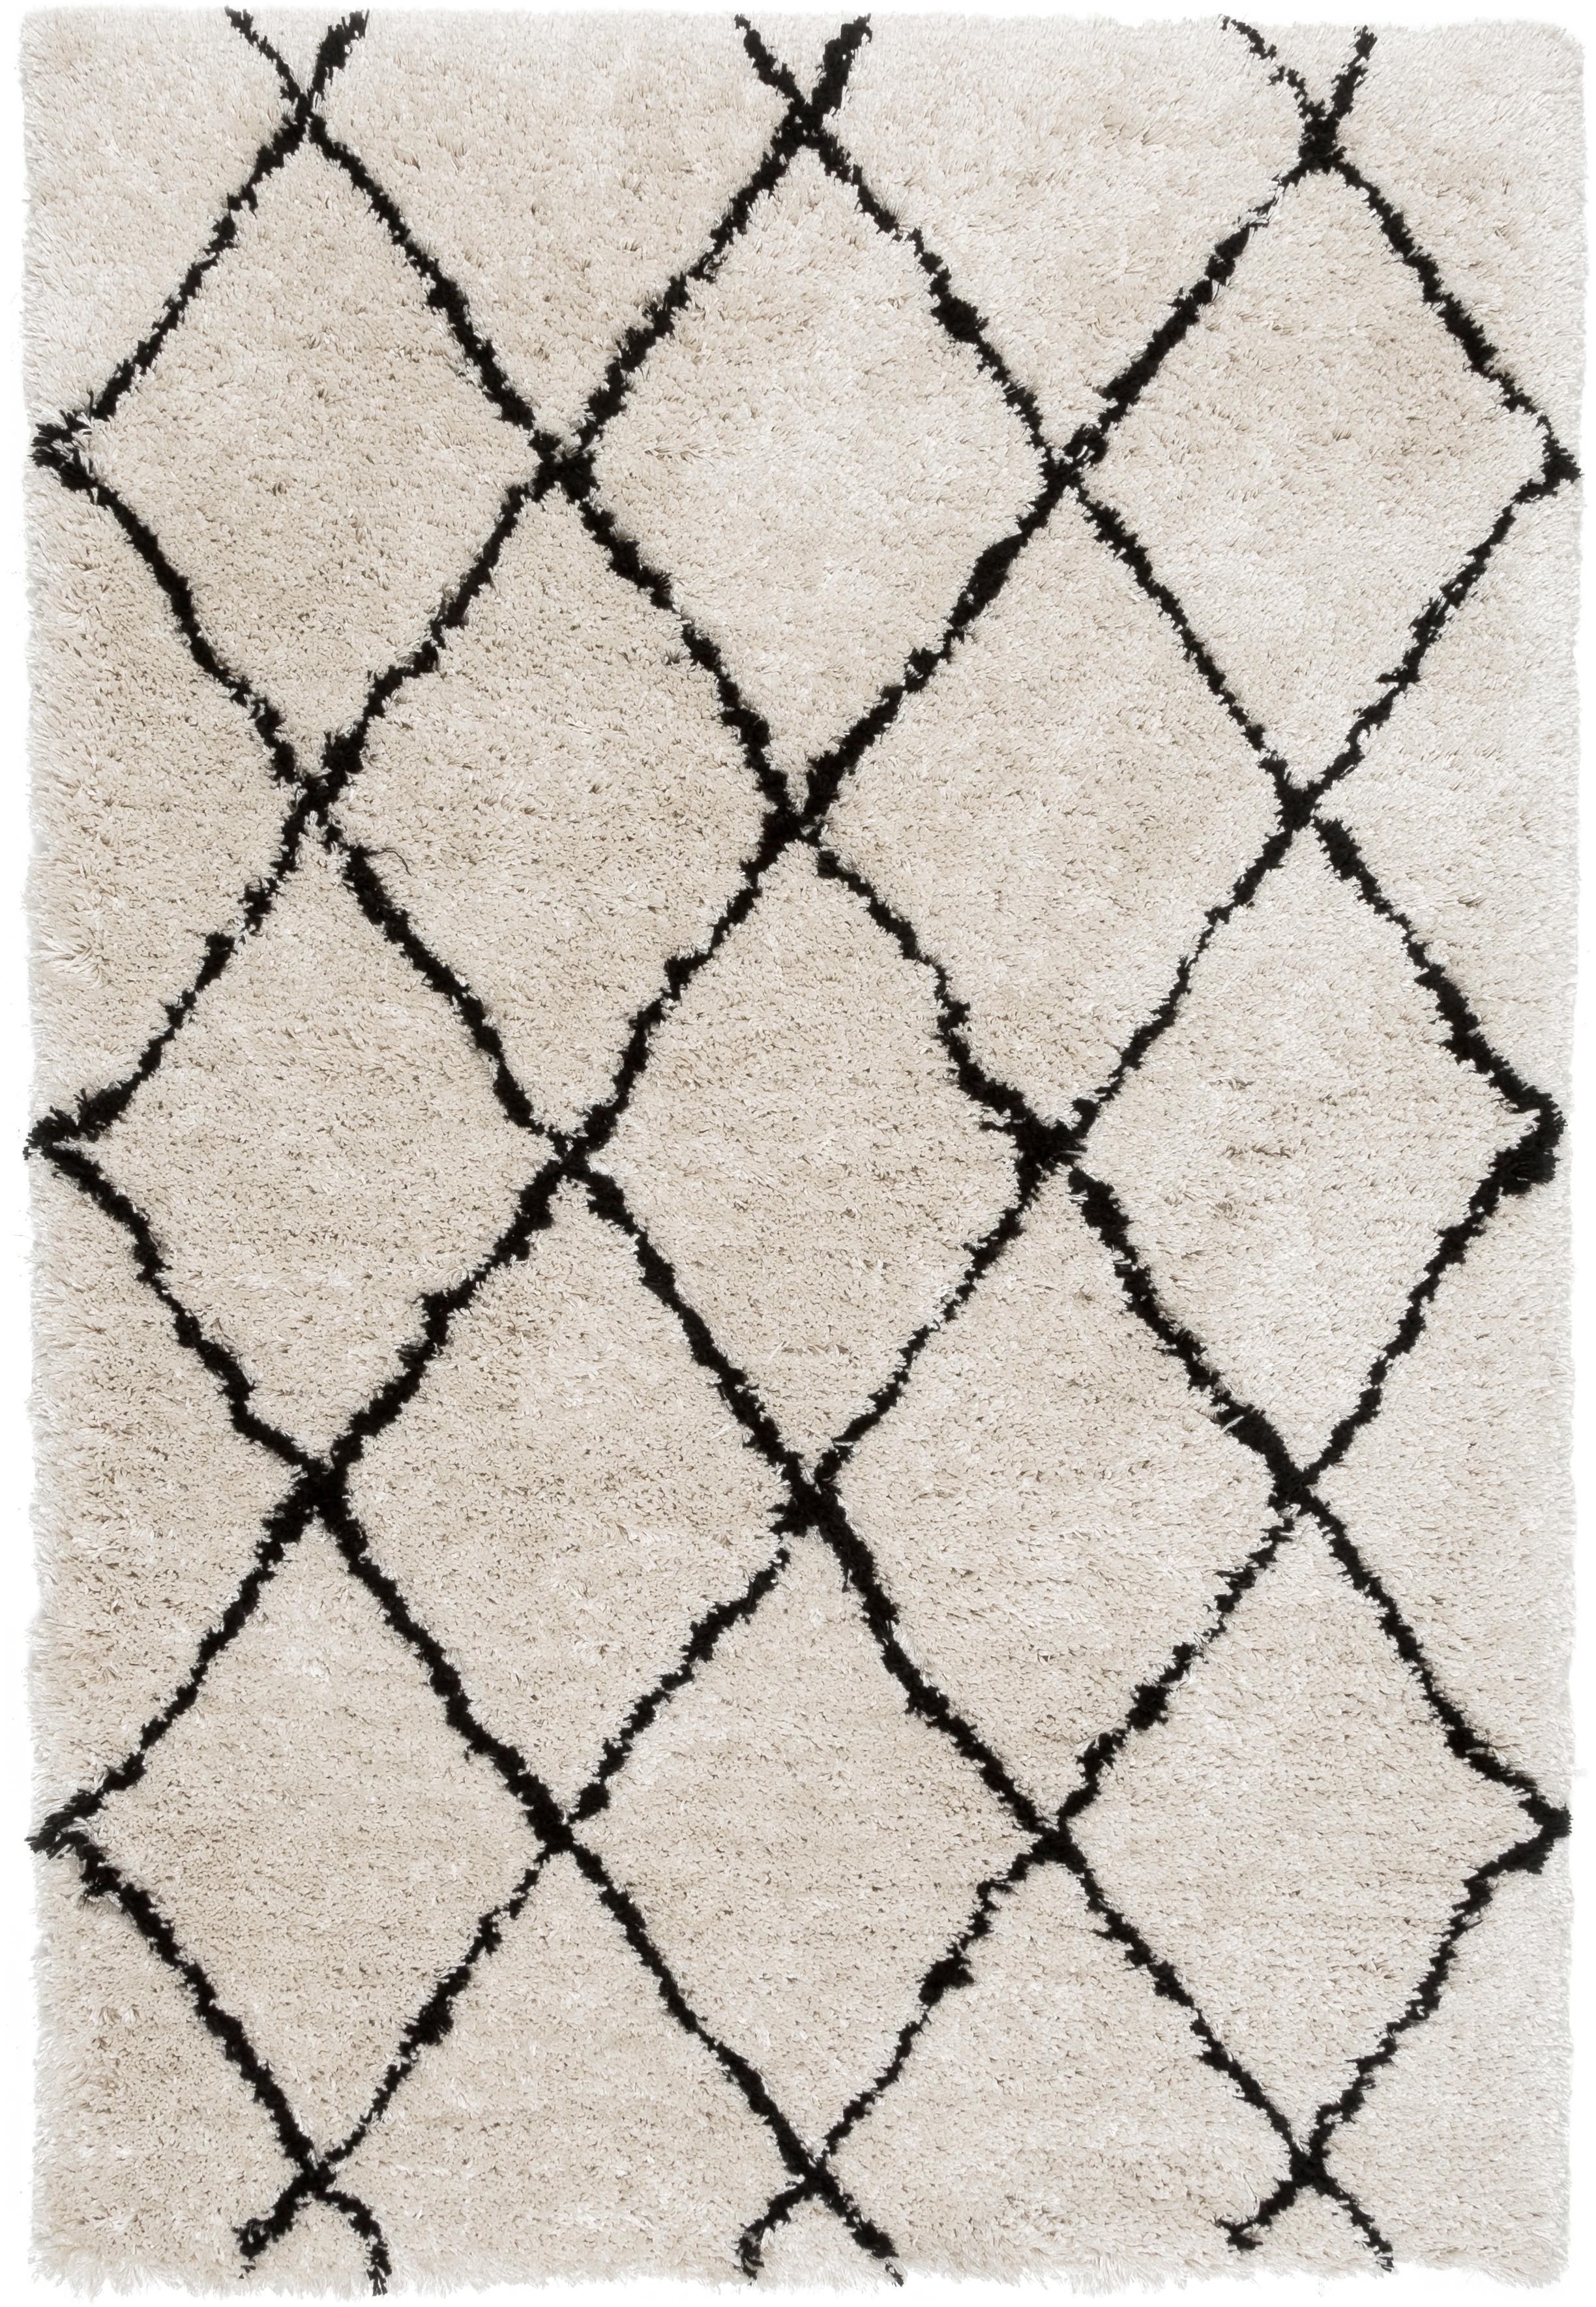 Alfombra artesanal de pelo largo Naima, Parte superior: 100%poliéster., Reverso: 100%algodón, Beige, negro, An 120 x L 180 cm (Tamaño S)